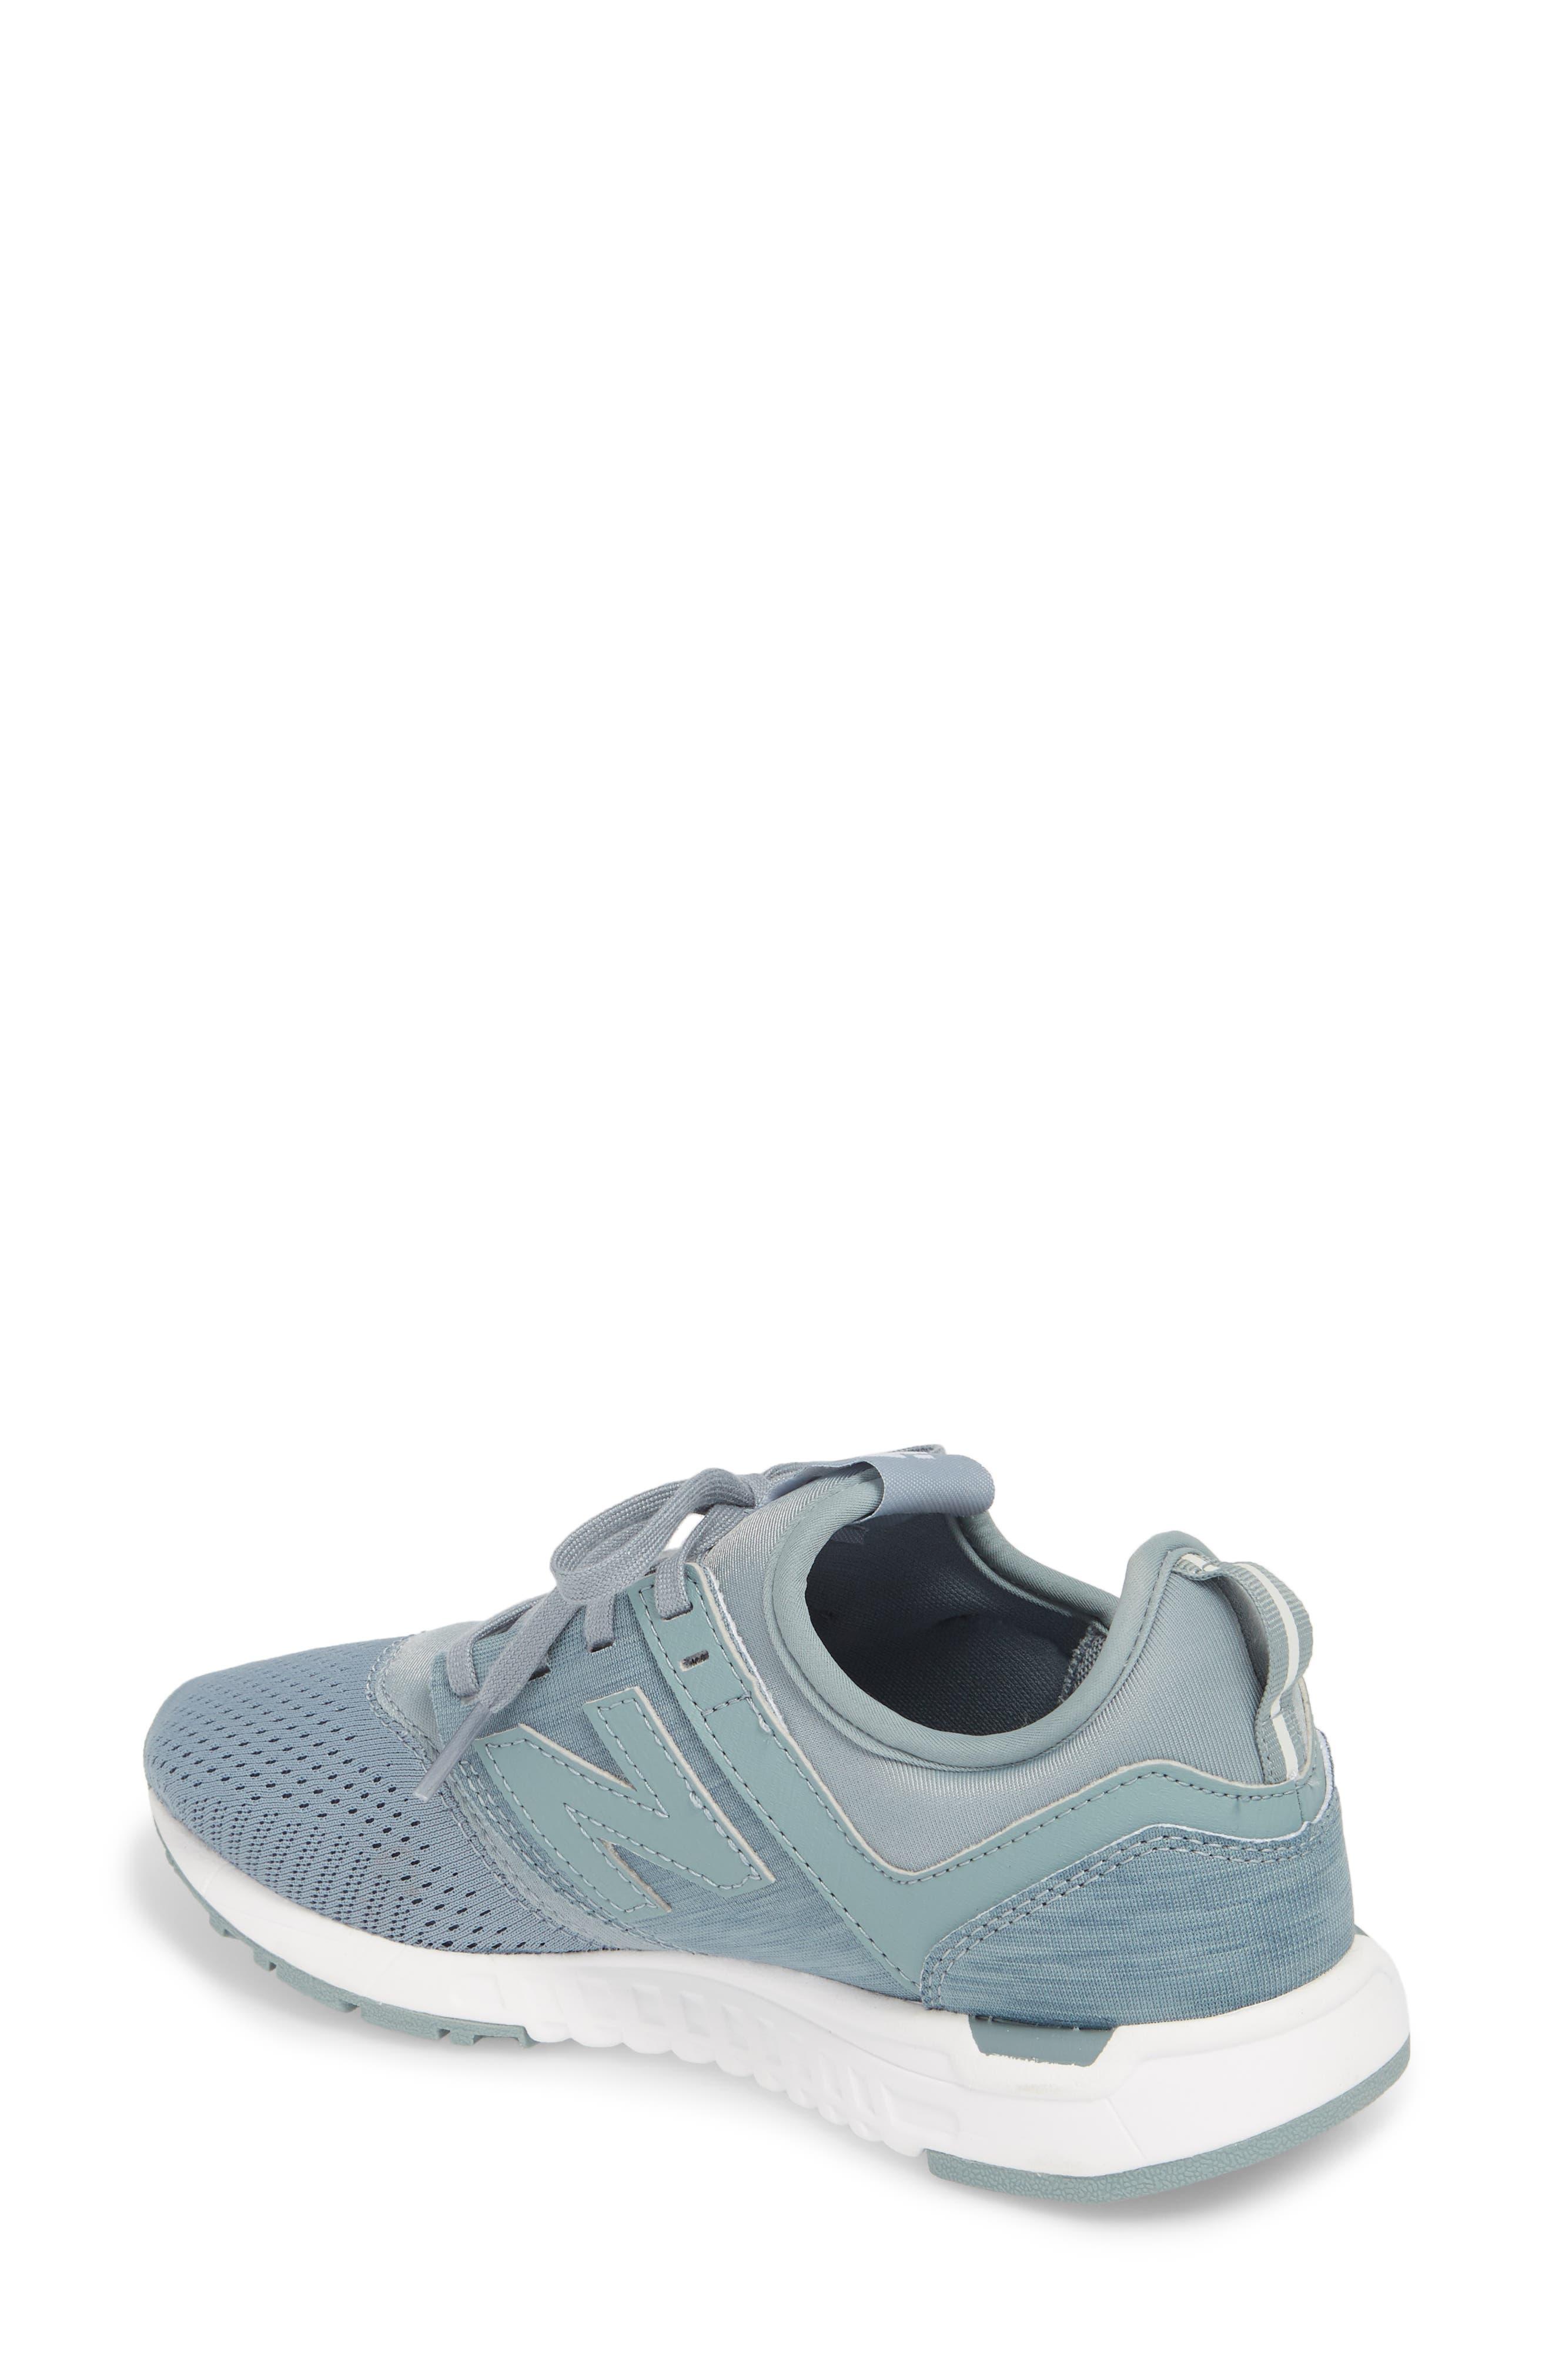 247 Classic Sneaker,                             Alternate thumbnail 3, color,